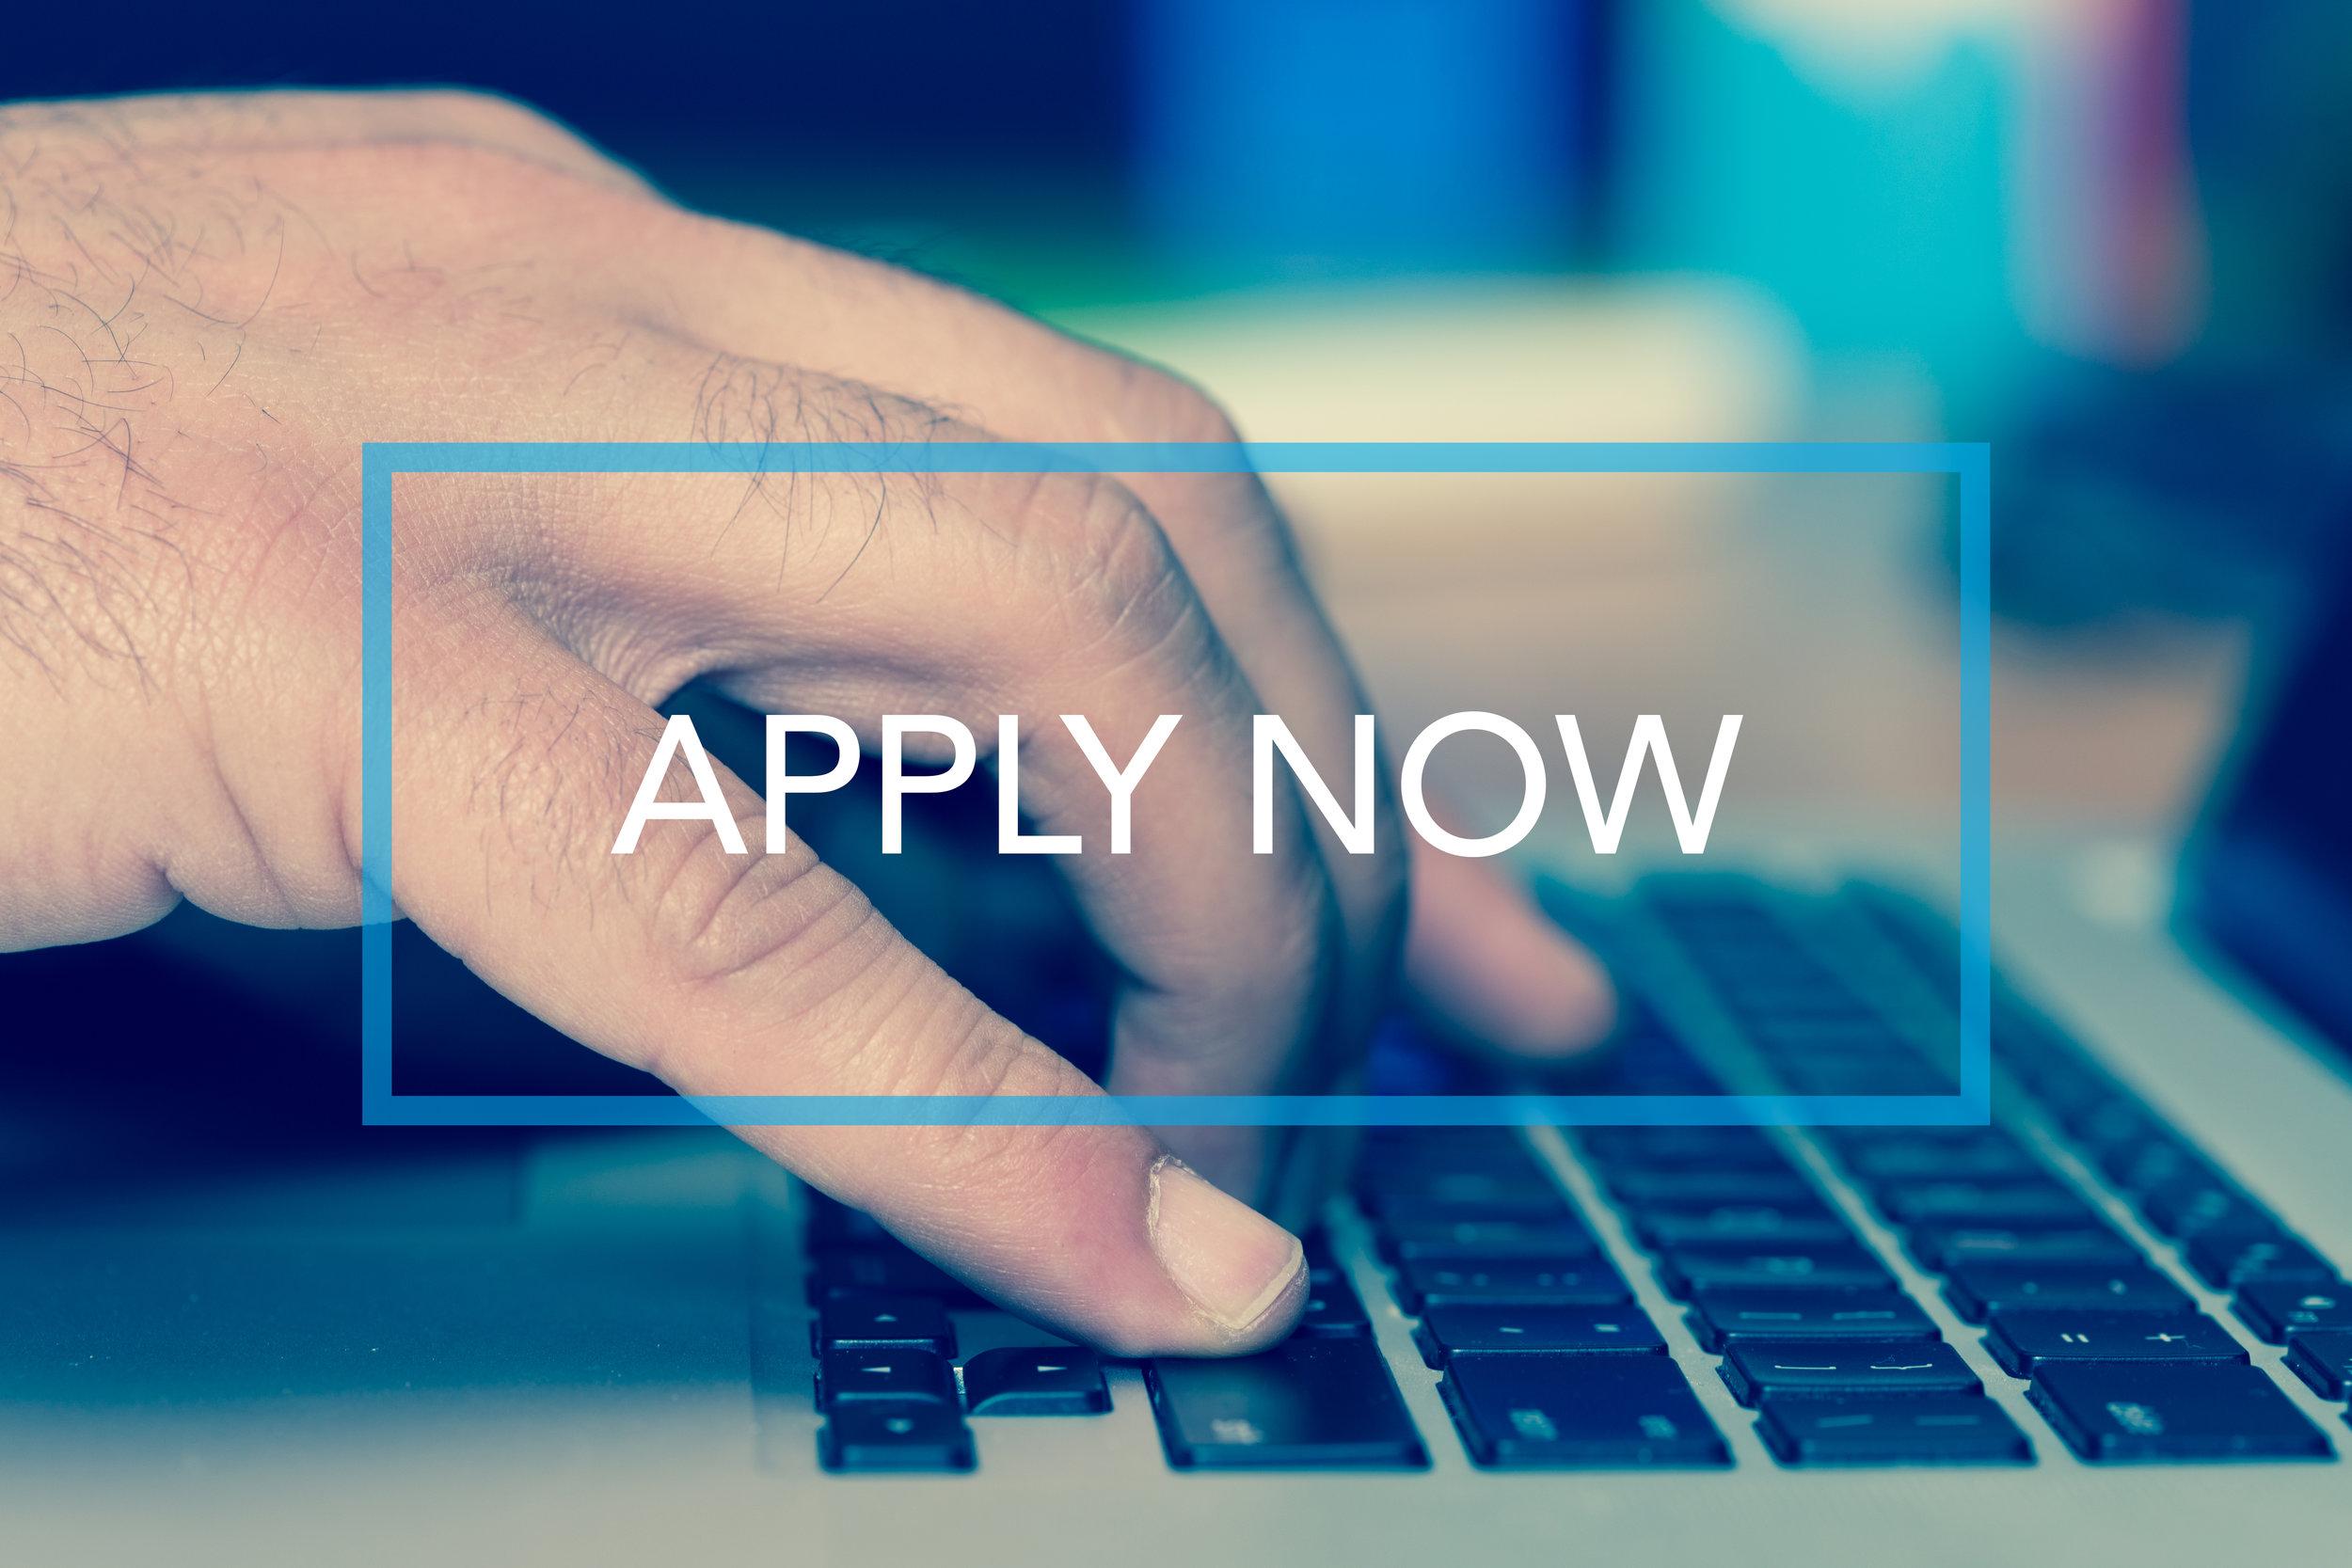 Apply now, hand on keyboard-iStock-857719502.jpg